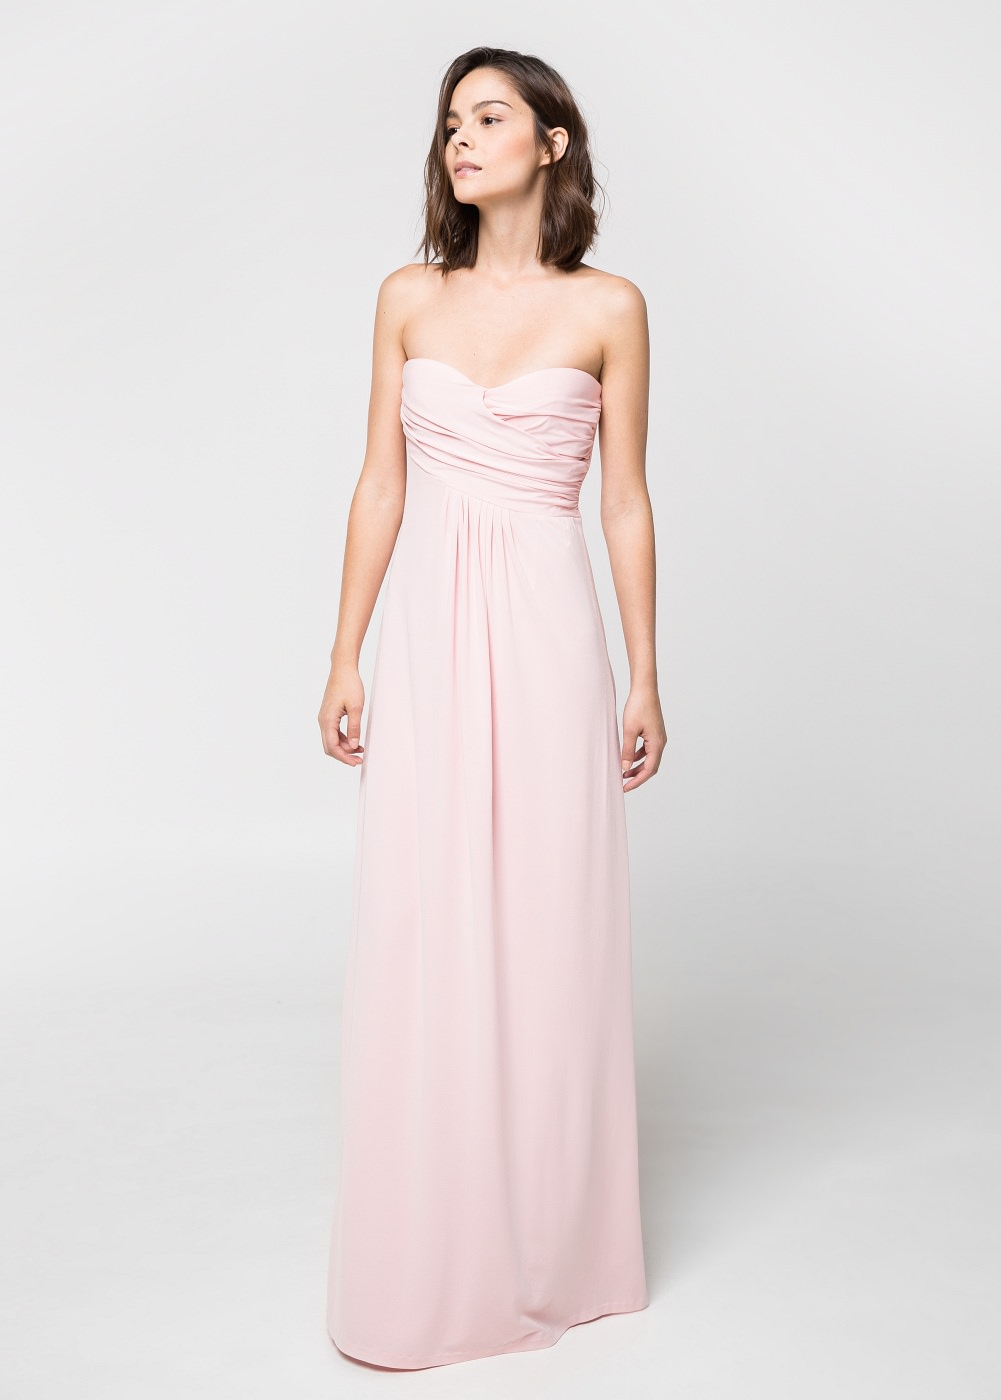 df600b7573a Robe longue mango knot - la robe longue